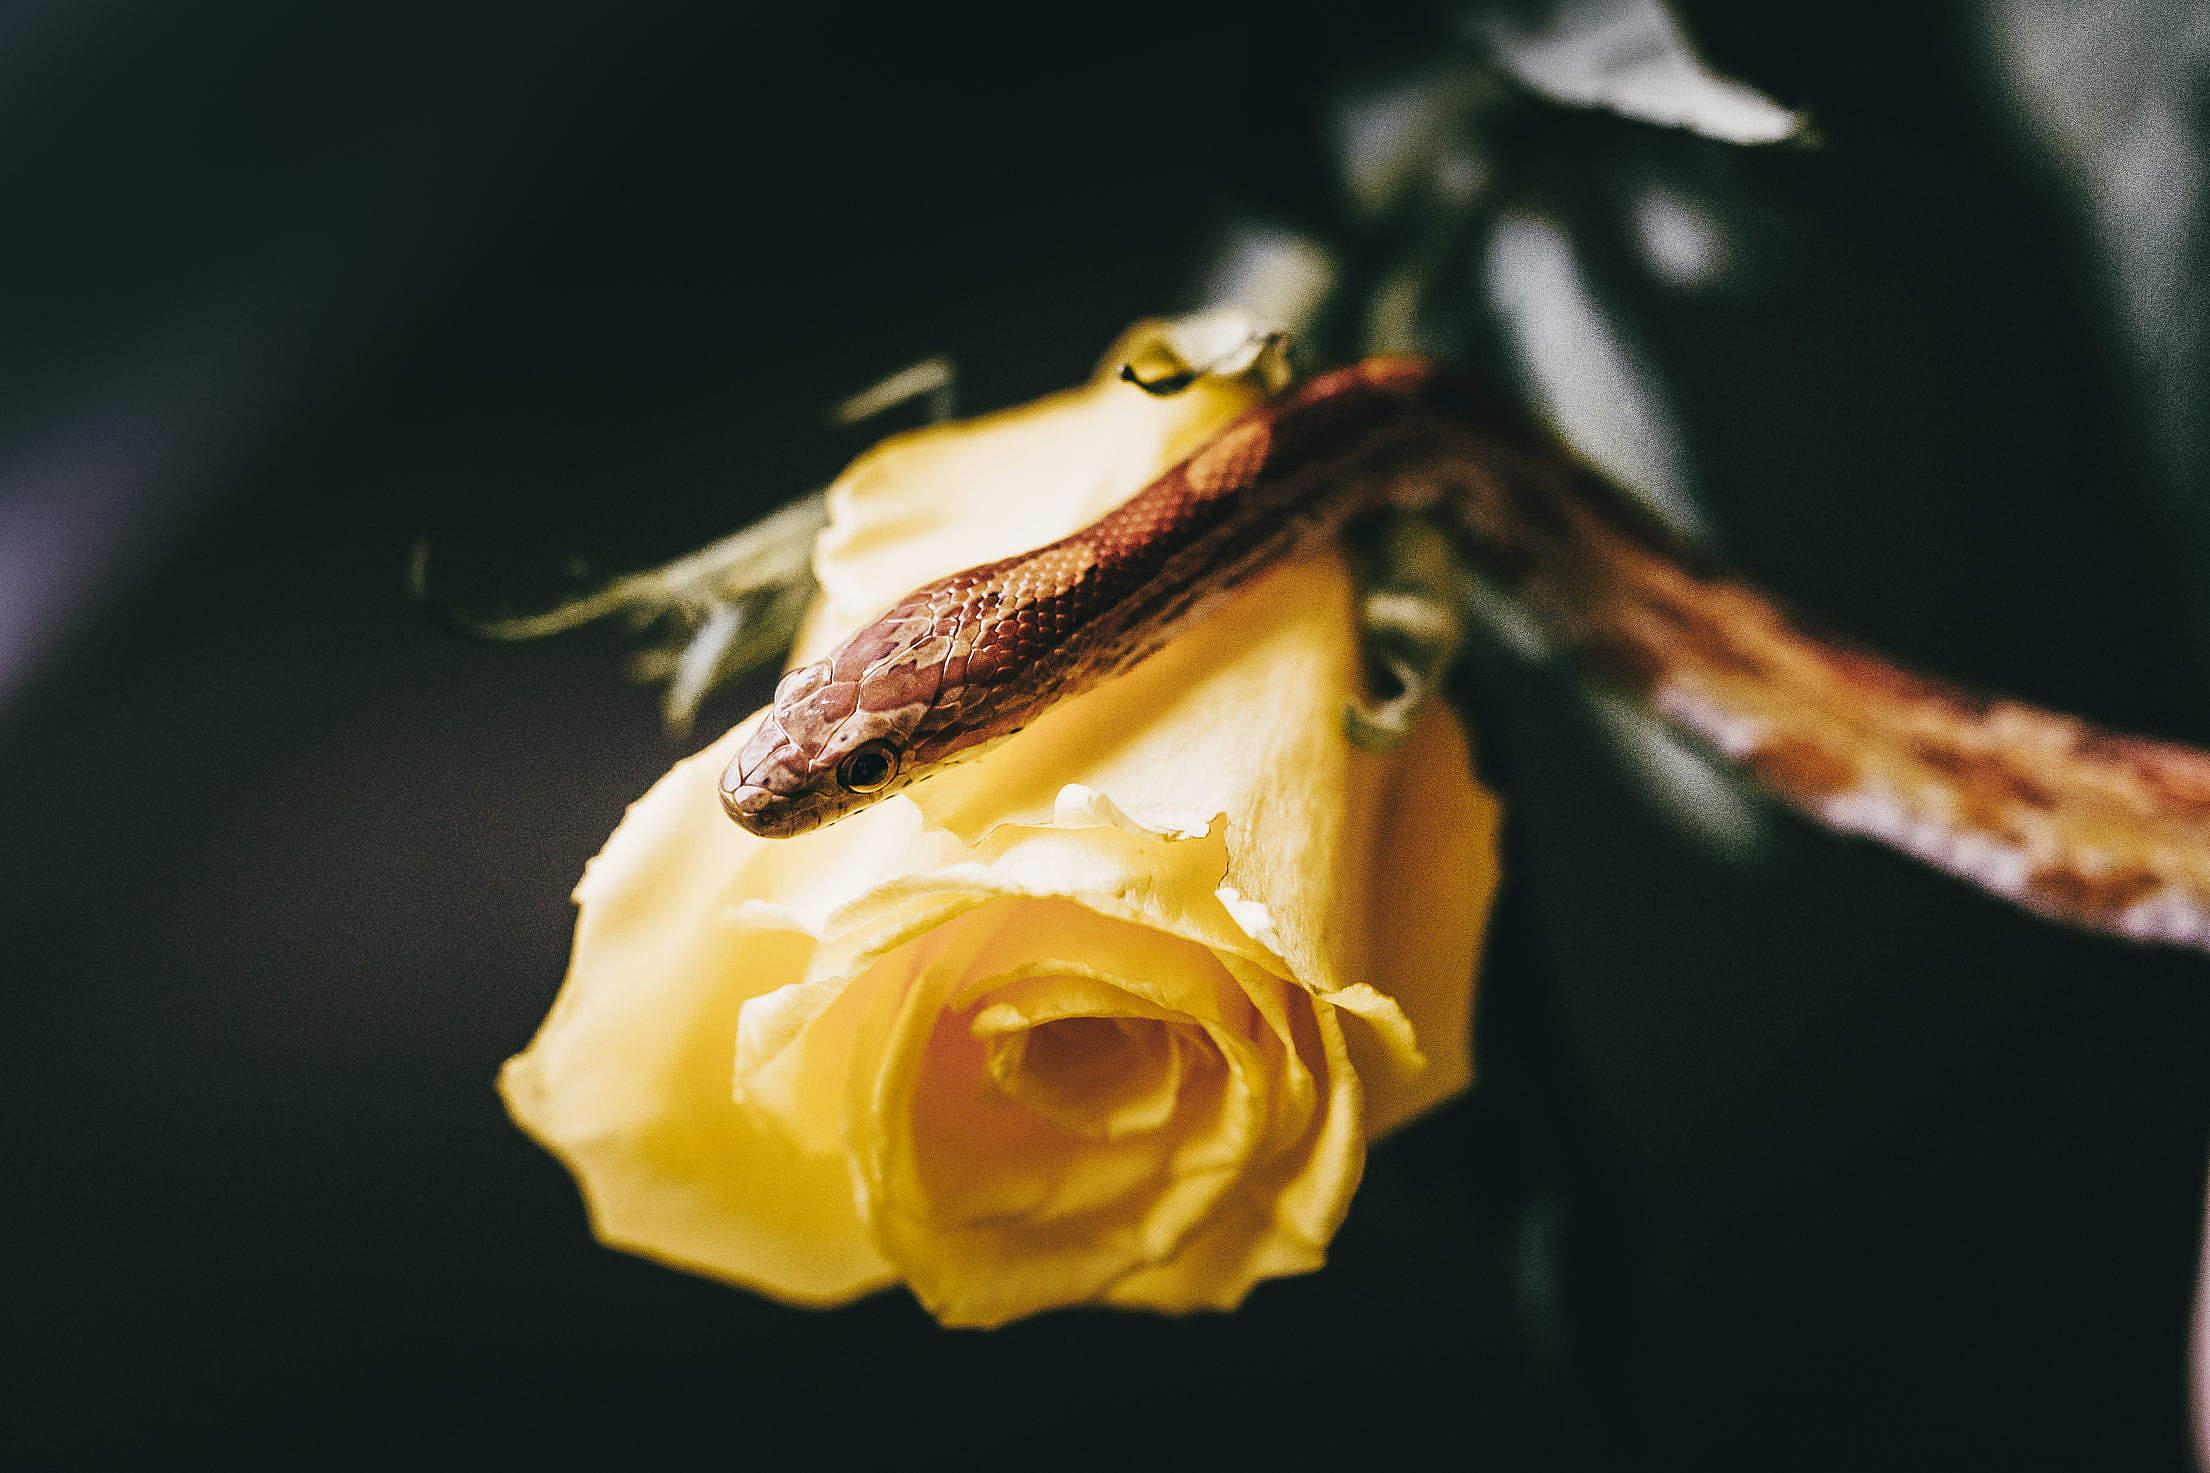 Snake on Yellow Rose Free Stock Photo